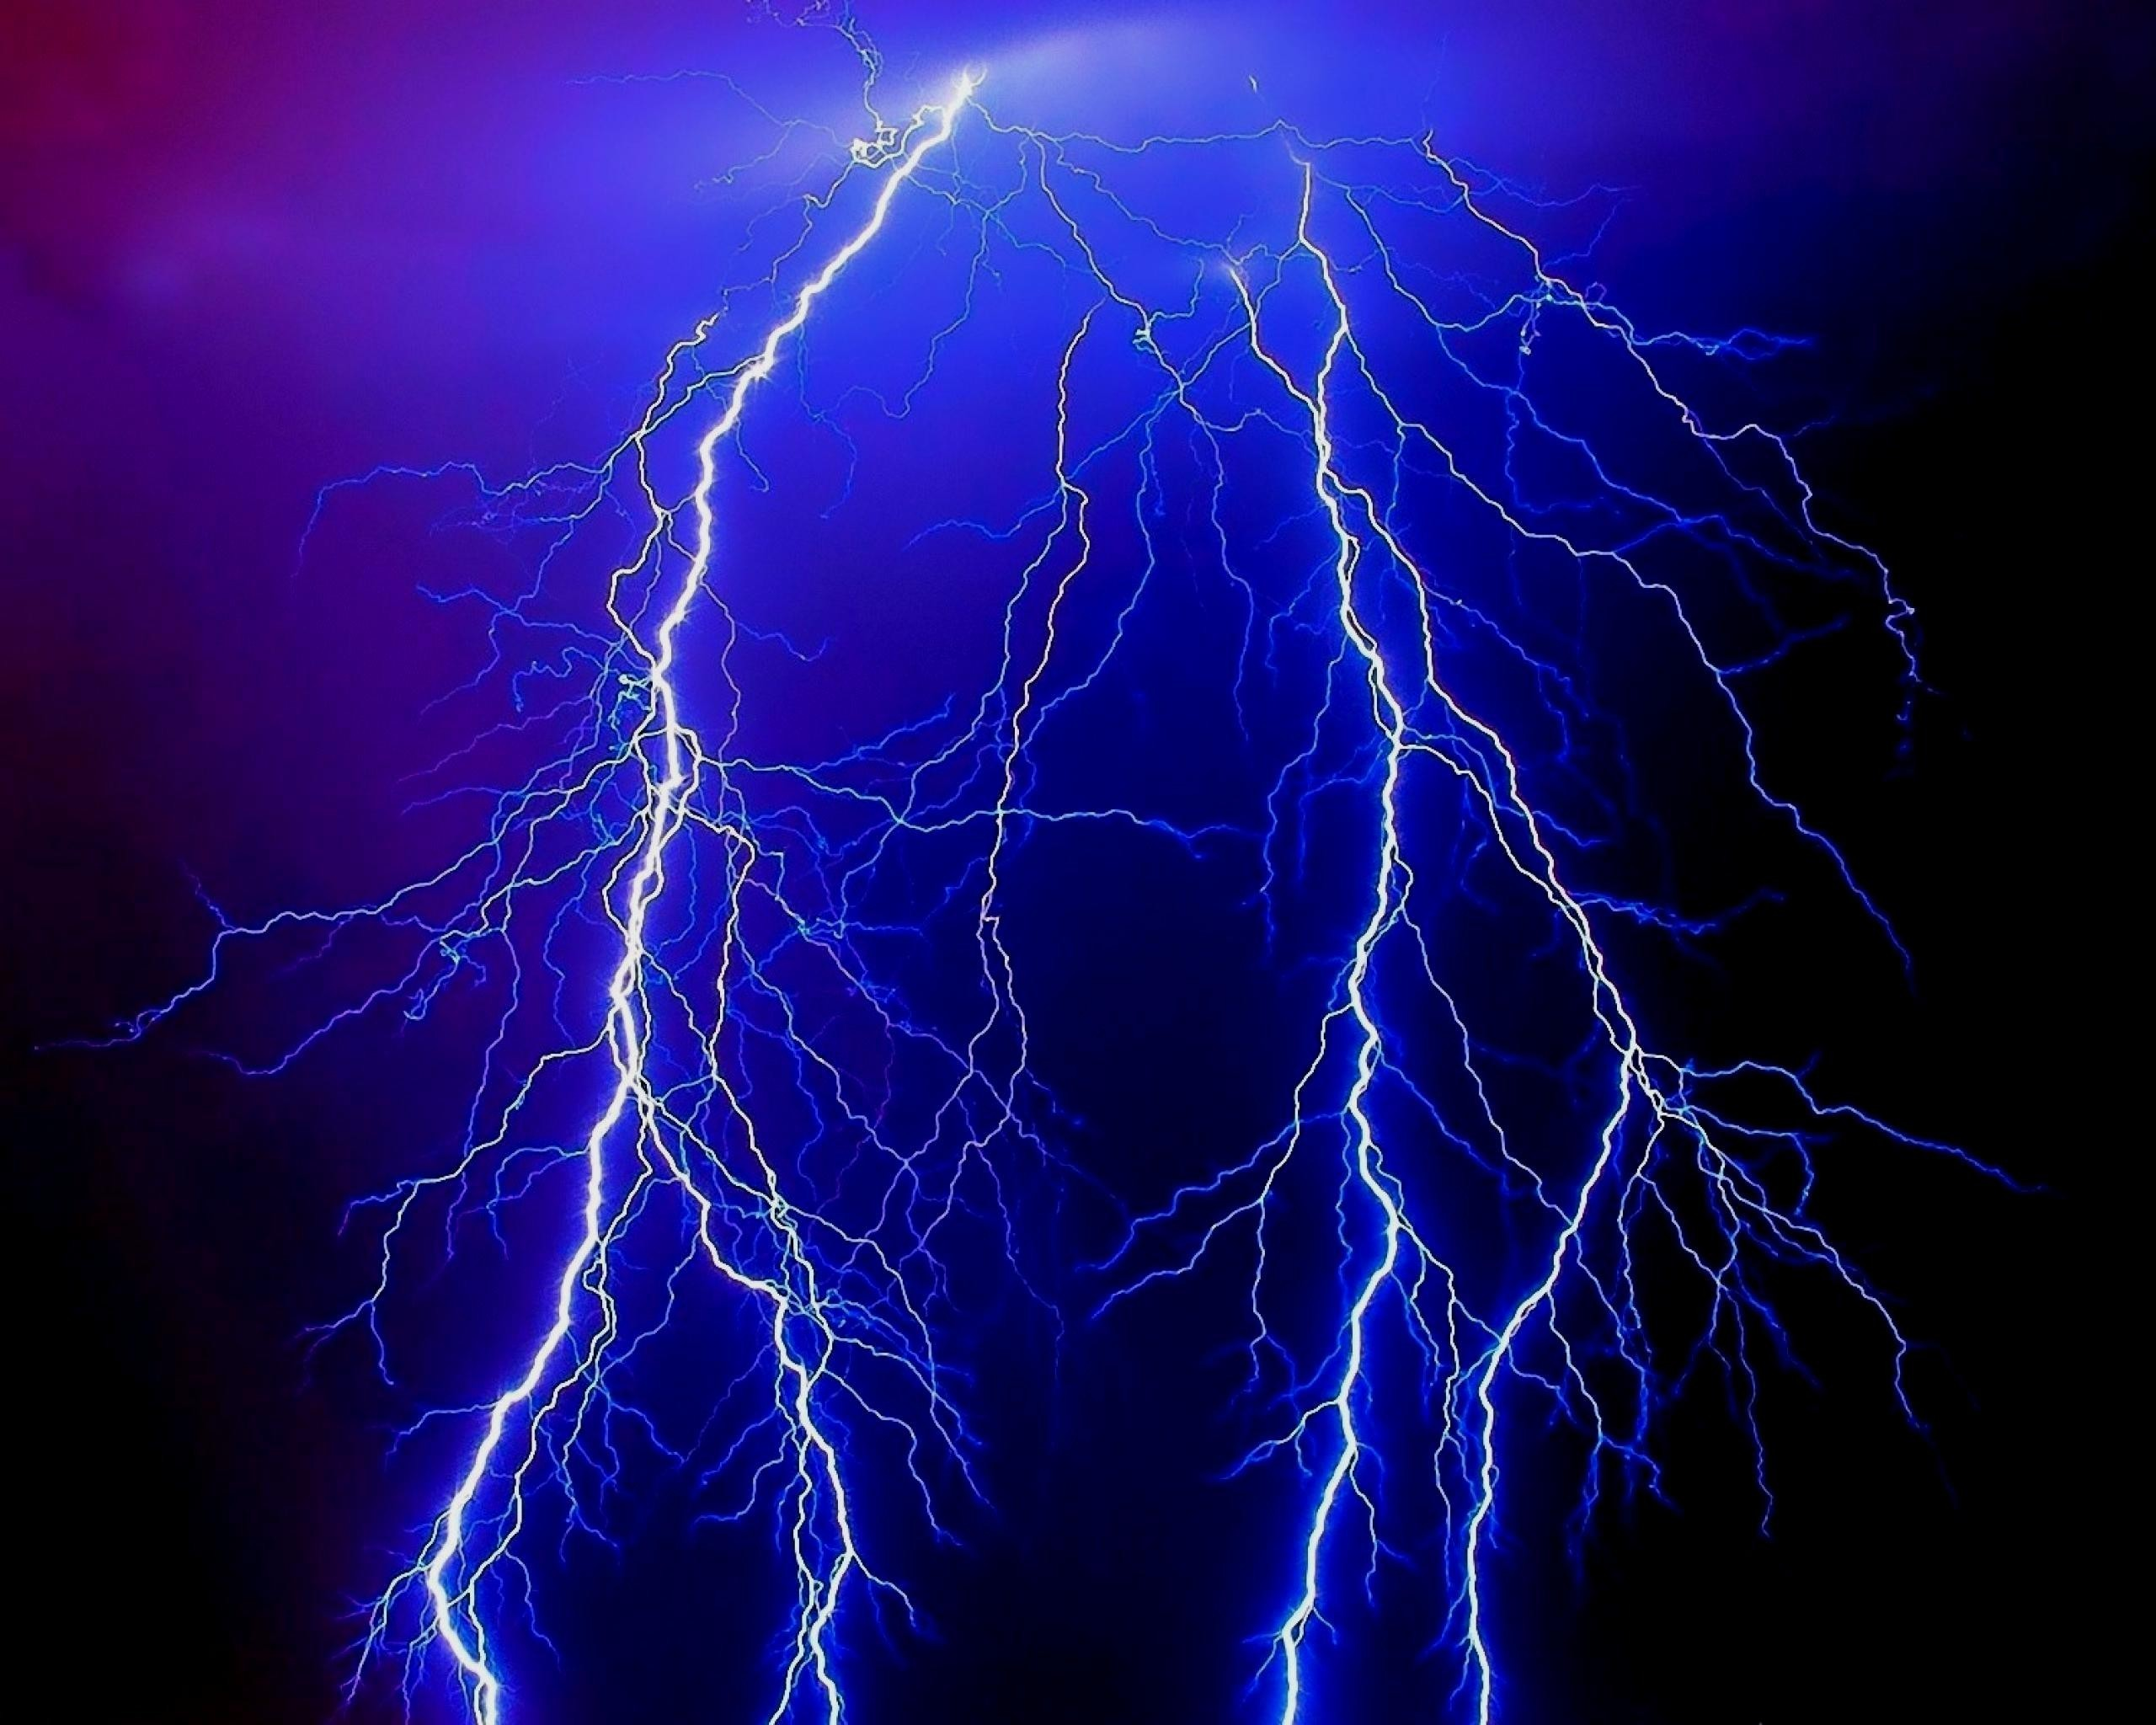 Demonic lightning